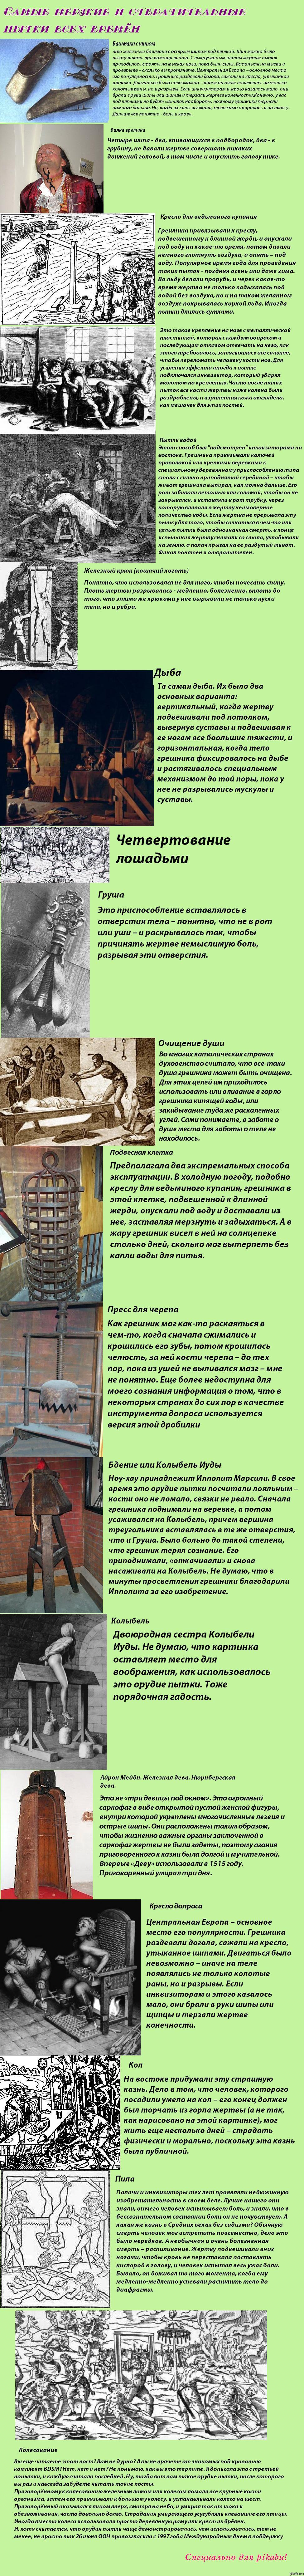 Садо мазо, БДСМ, пытки | Pornokaif.net